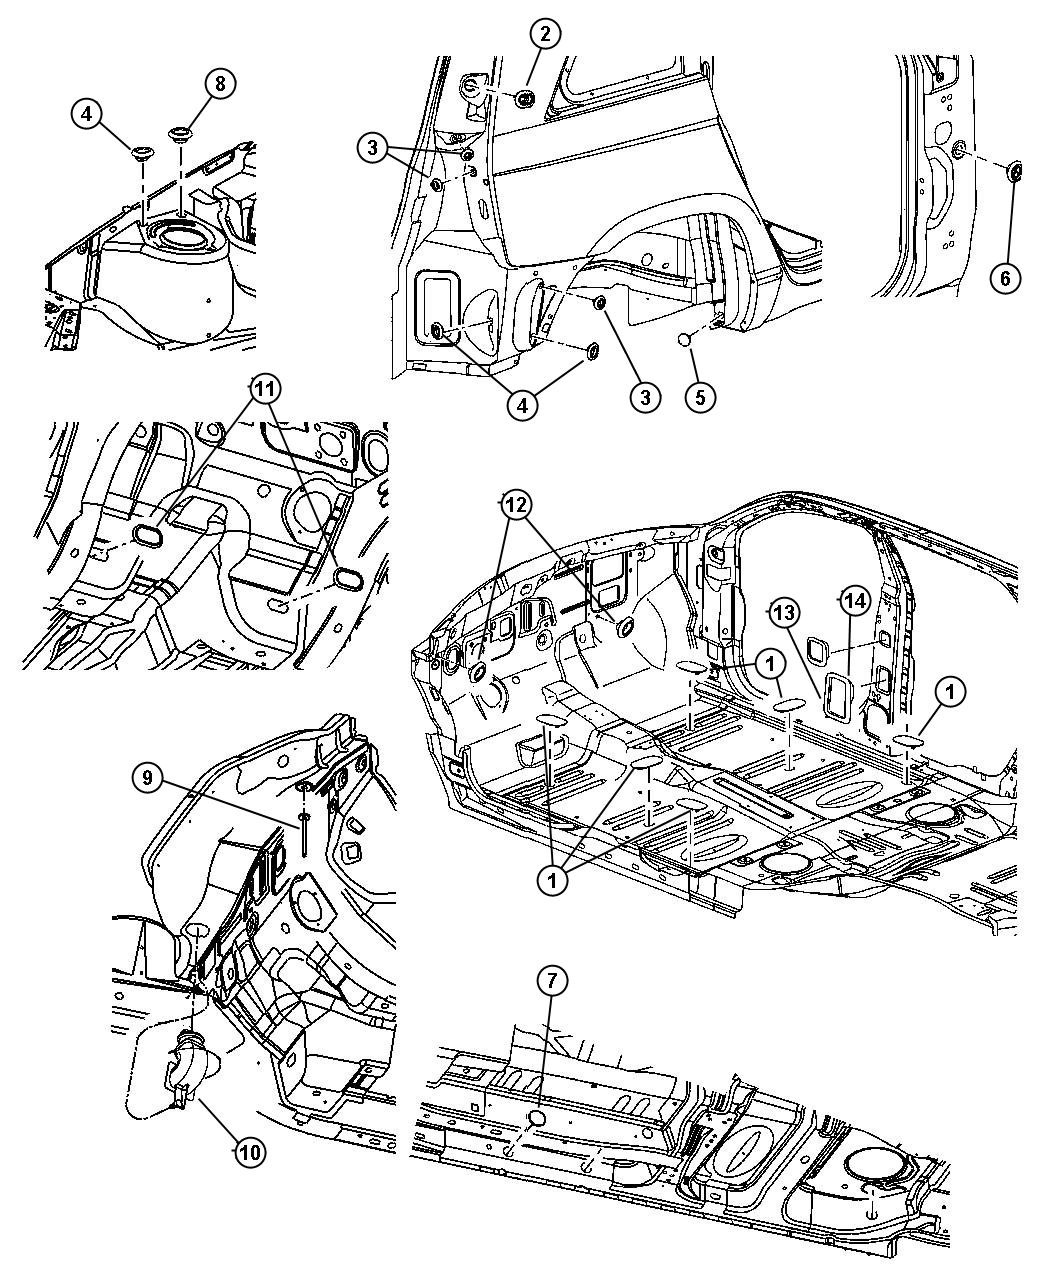 2006 Chrysler Pacifica Seal. Cowl. Lower drain. Dash